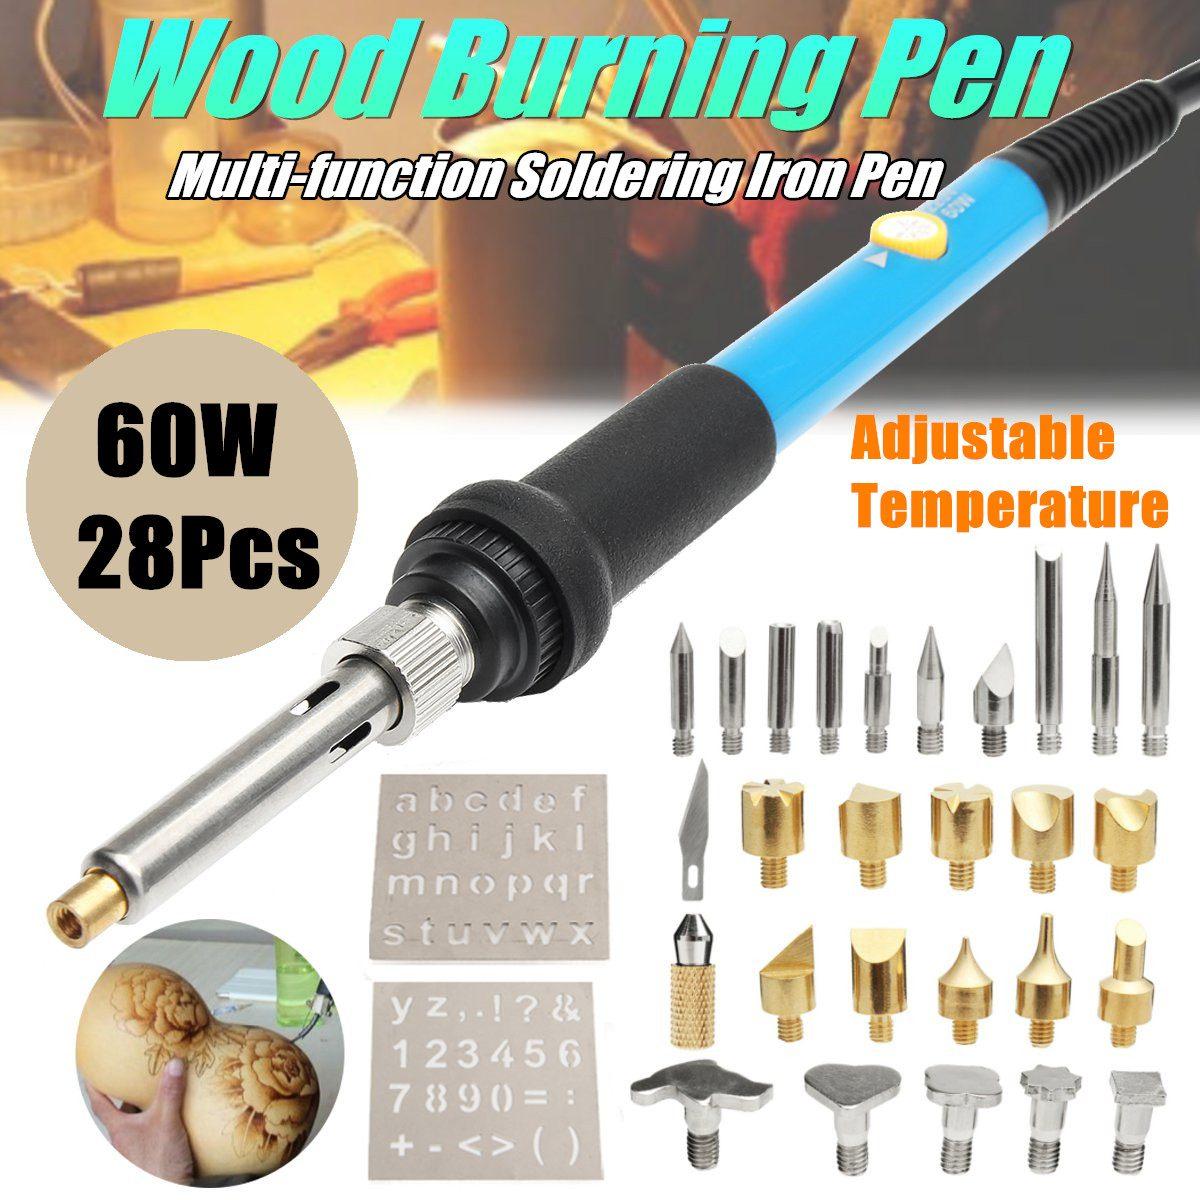 110V 60W 28Pcs Electric Soldering Iron Tools Set Temperature Adjust Wood Burning Pyrography Engrave Solder Tool Kit Brass + Tips